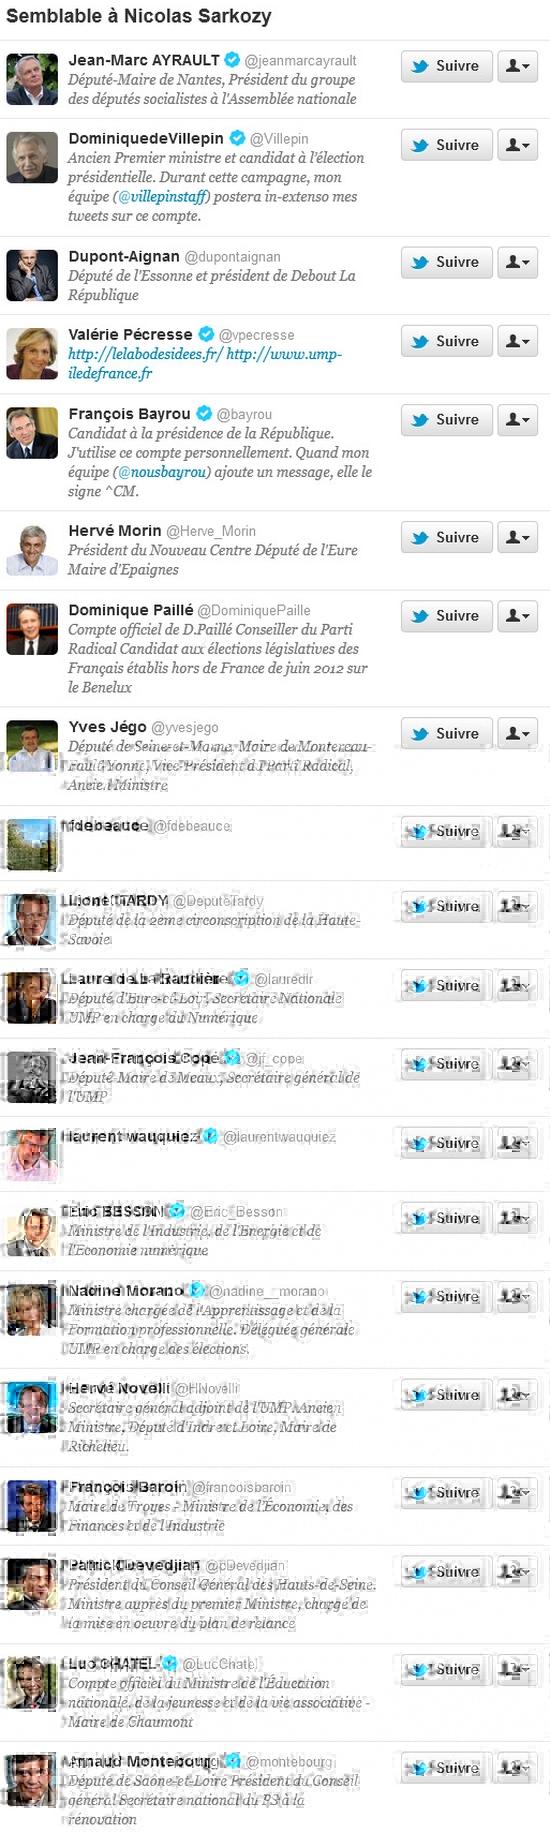 Les semblables de Nicolas Sarkozy, selon Twitter !